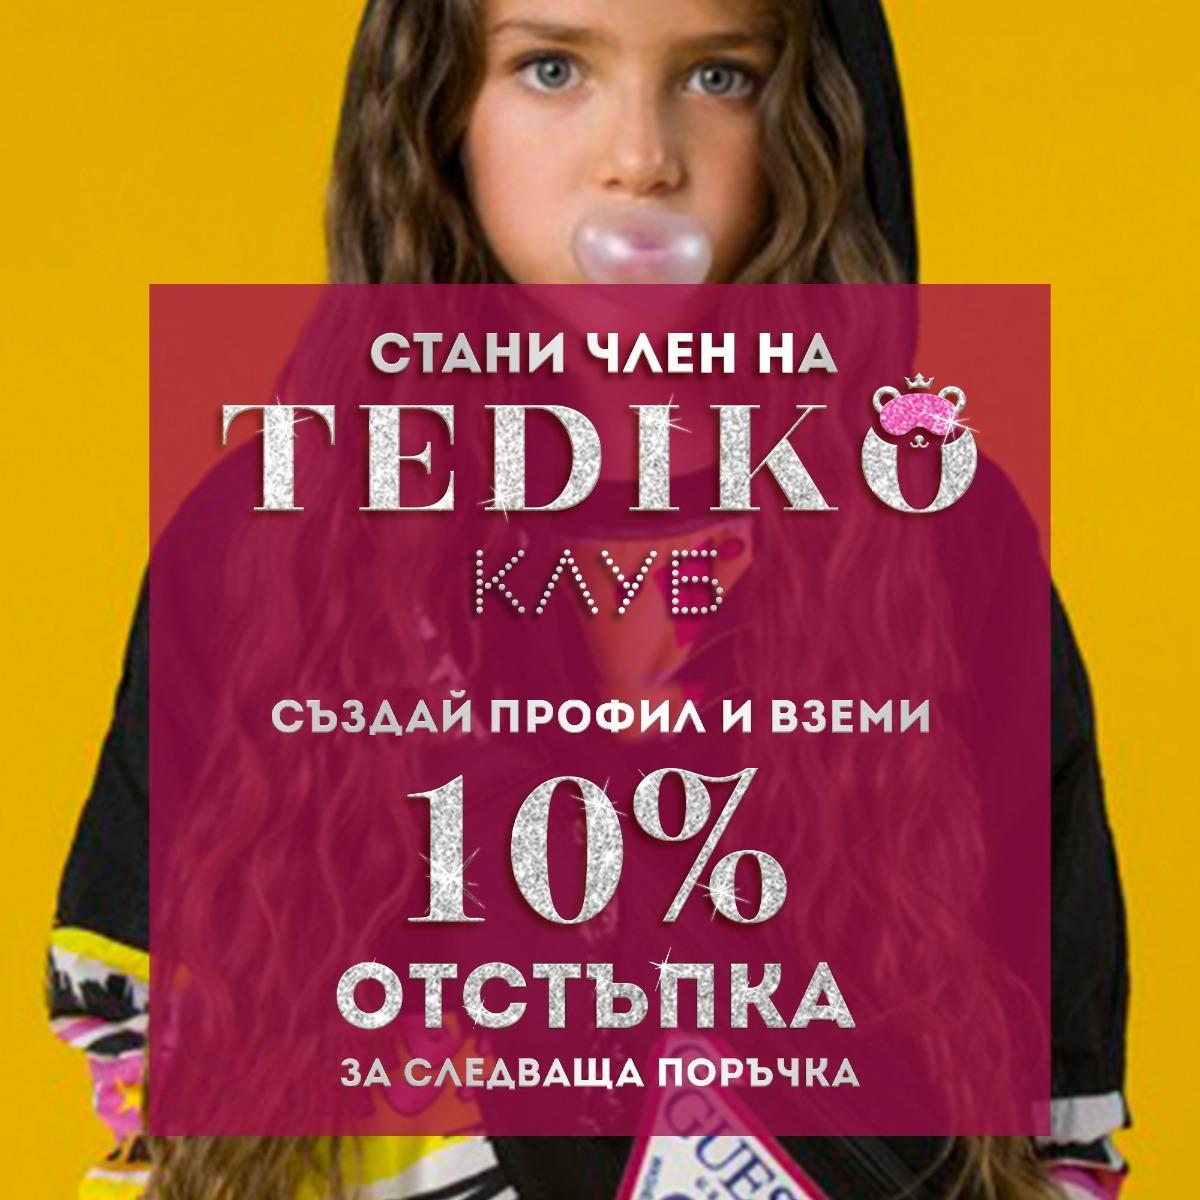 Стани Член на TEDIKO КЛУБ!